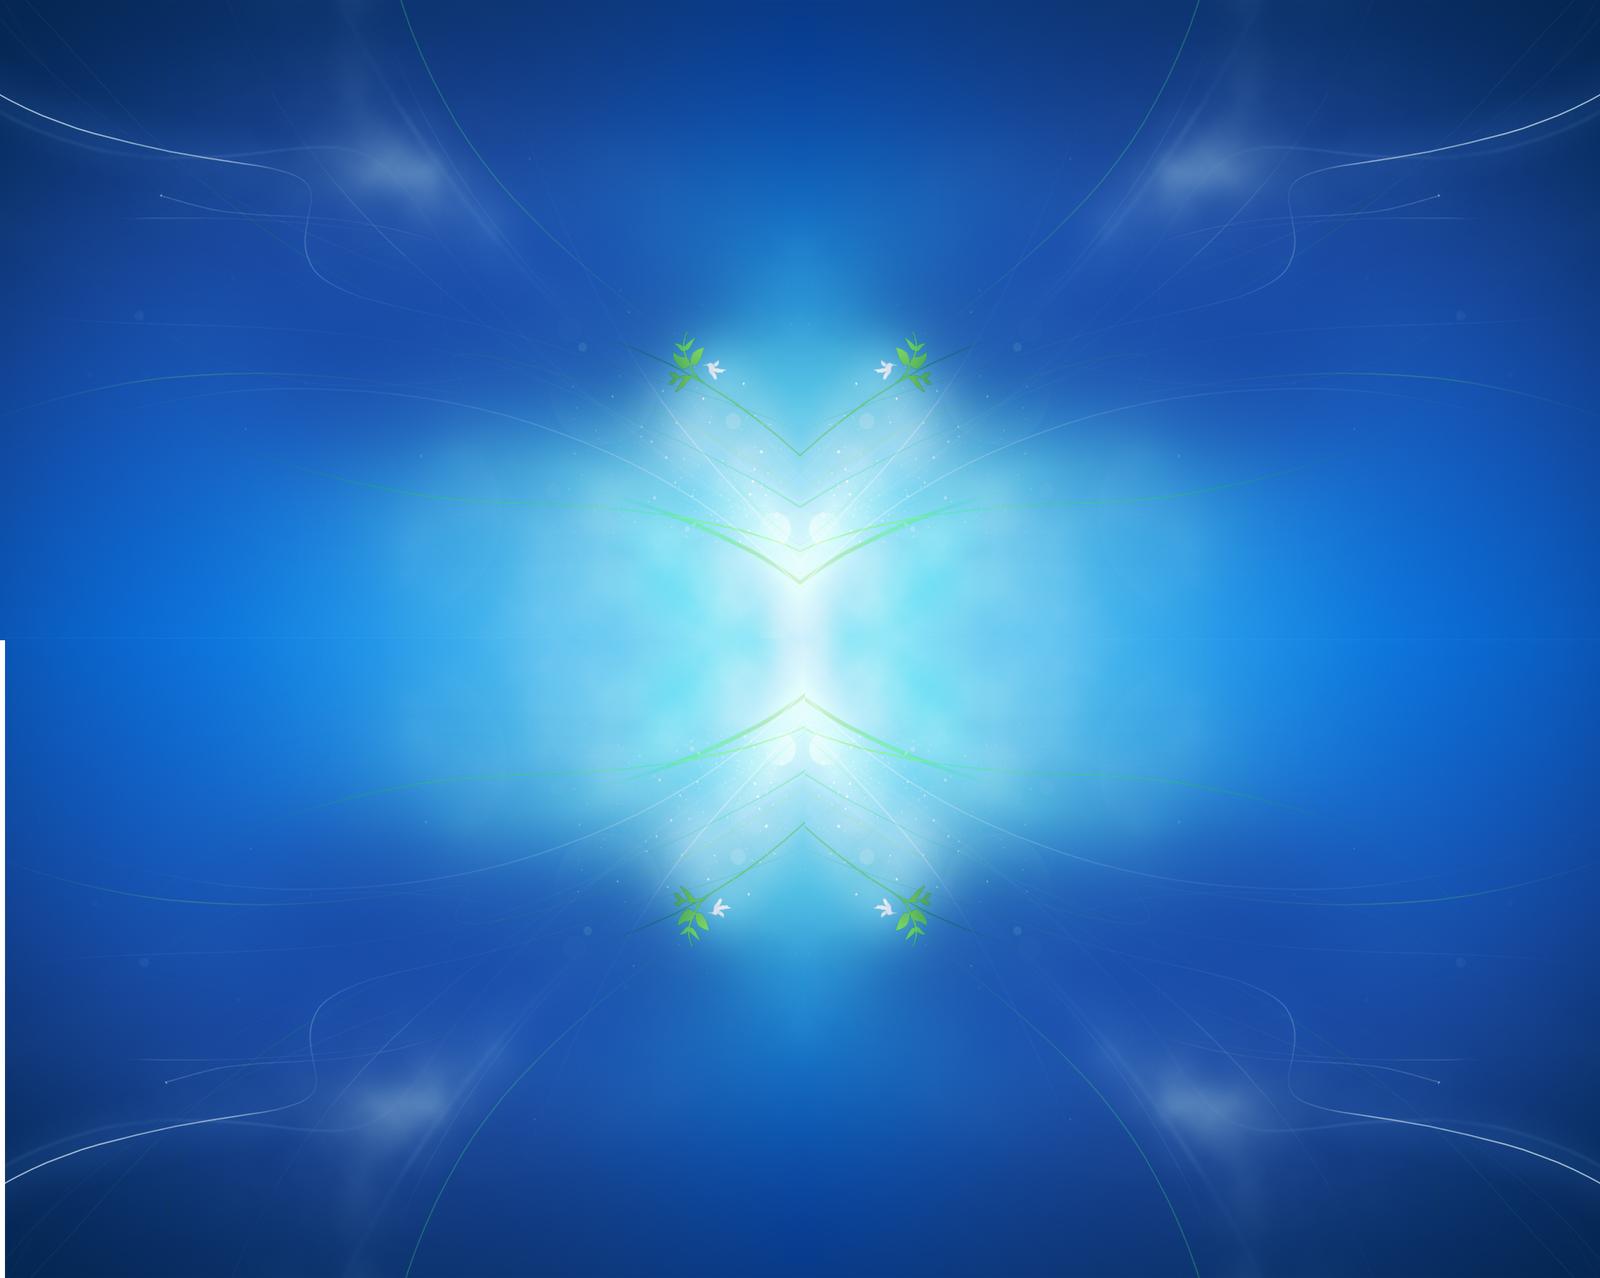 Windows 7 Blue Wallpapers Best Desktop Hd Wallpapers 1600x1278